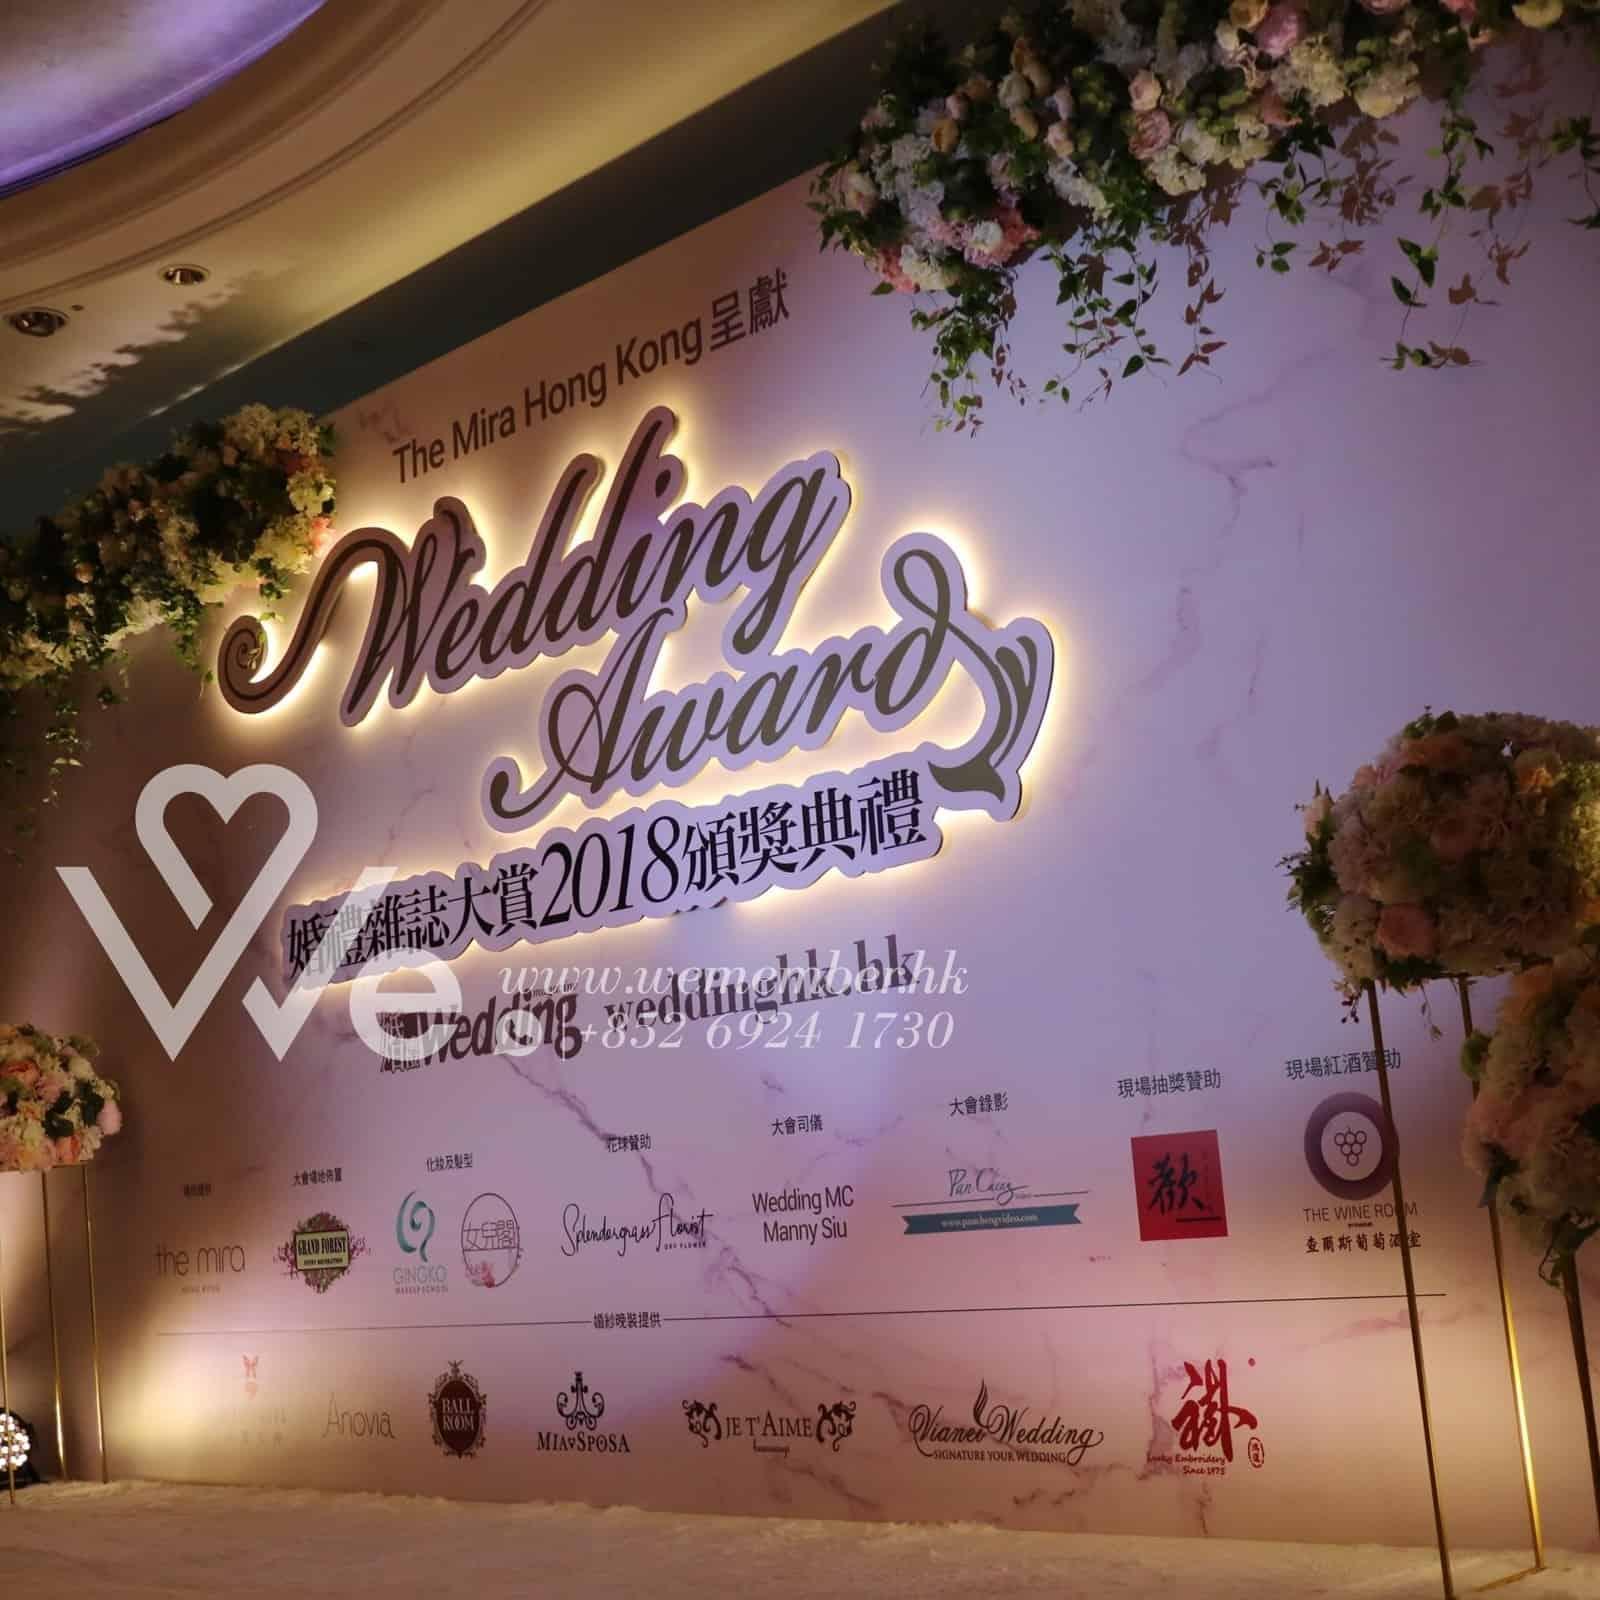 WeddingHKWeddingAward2018